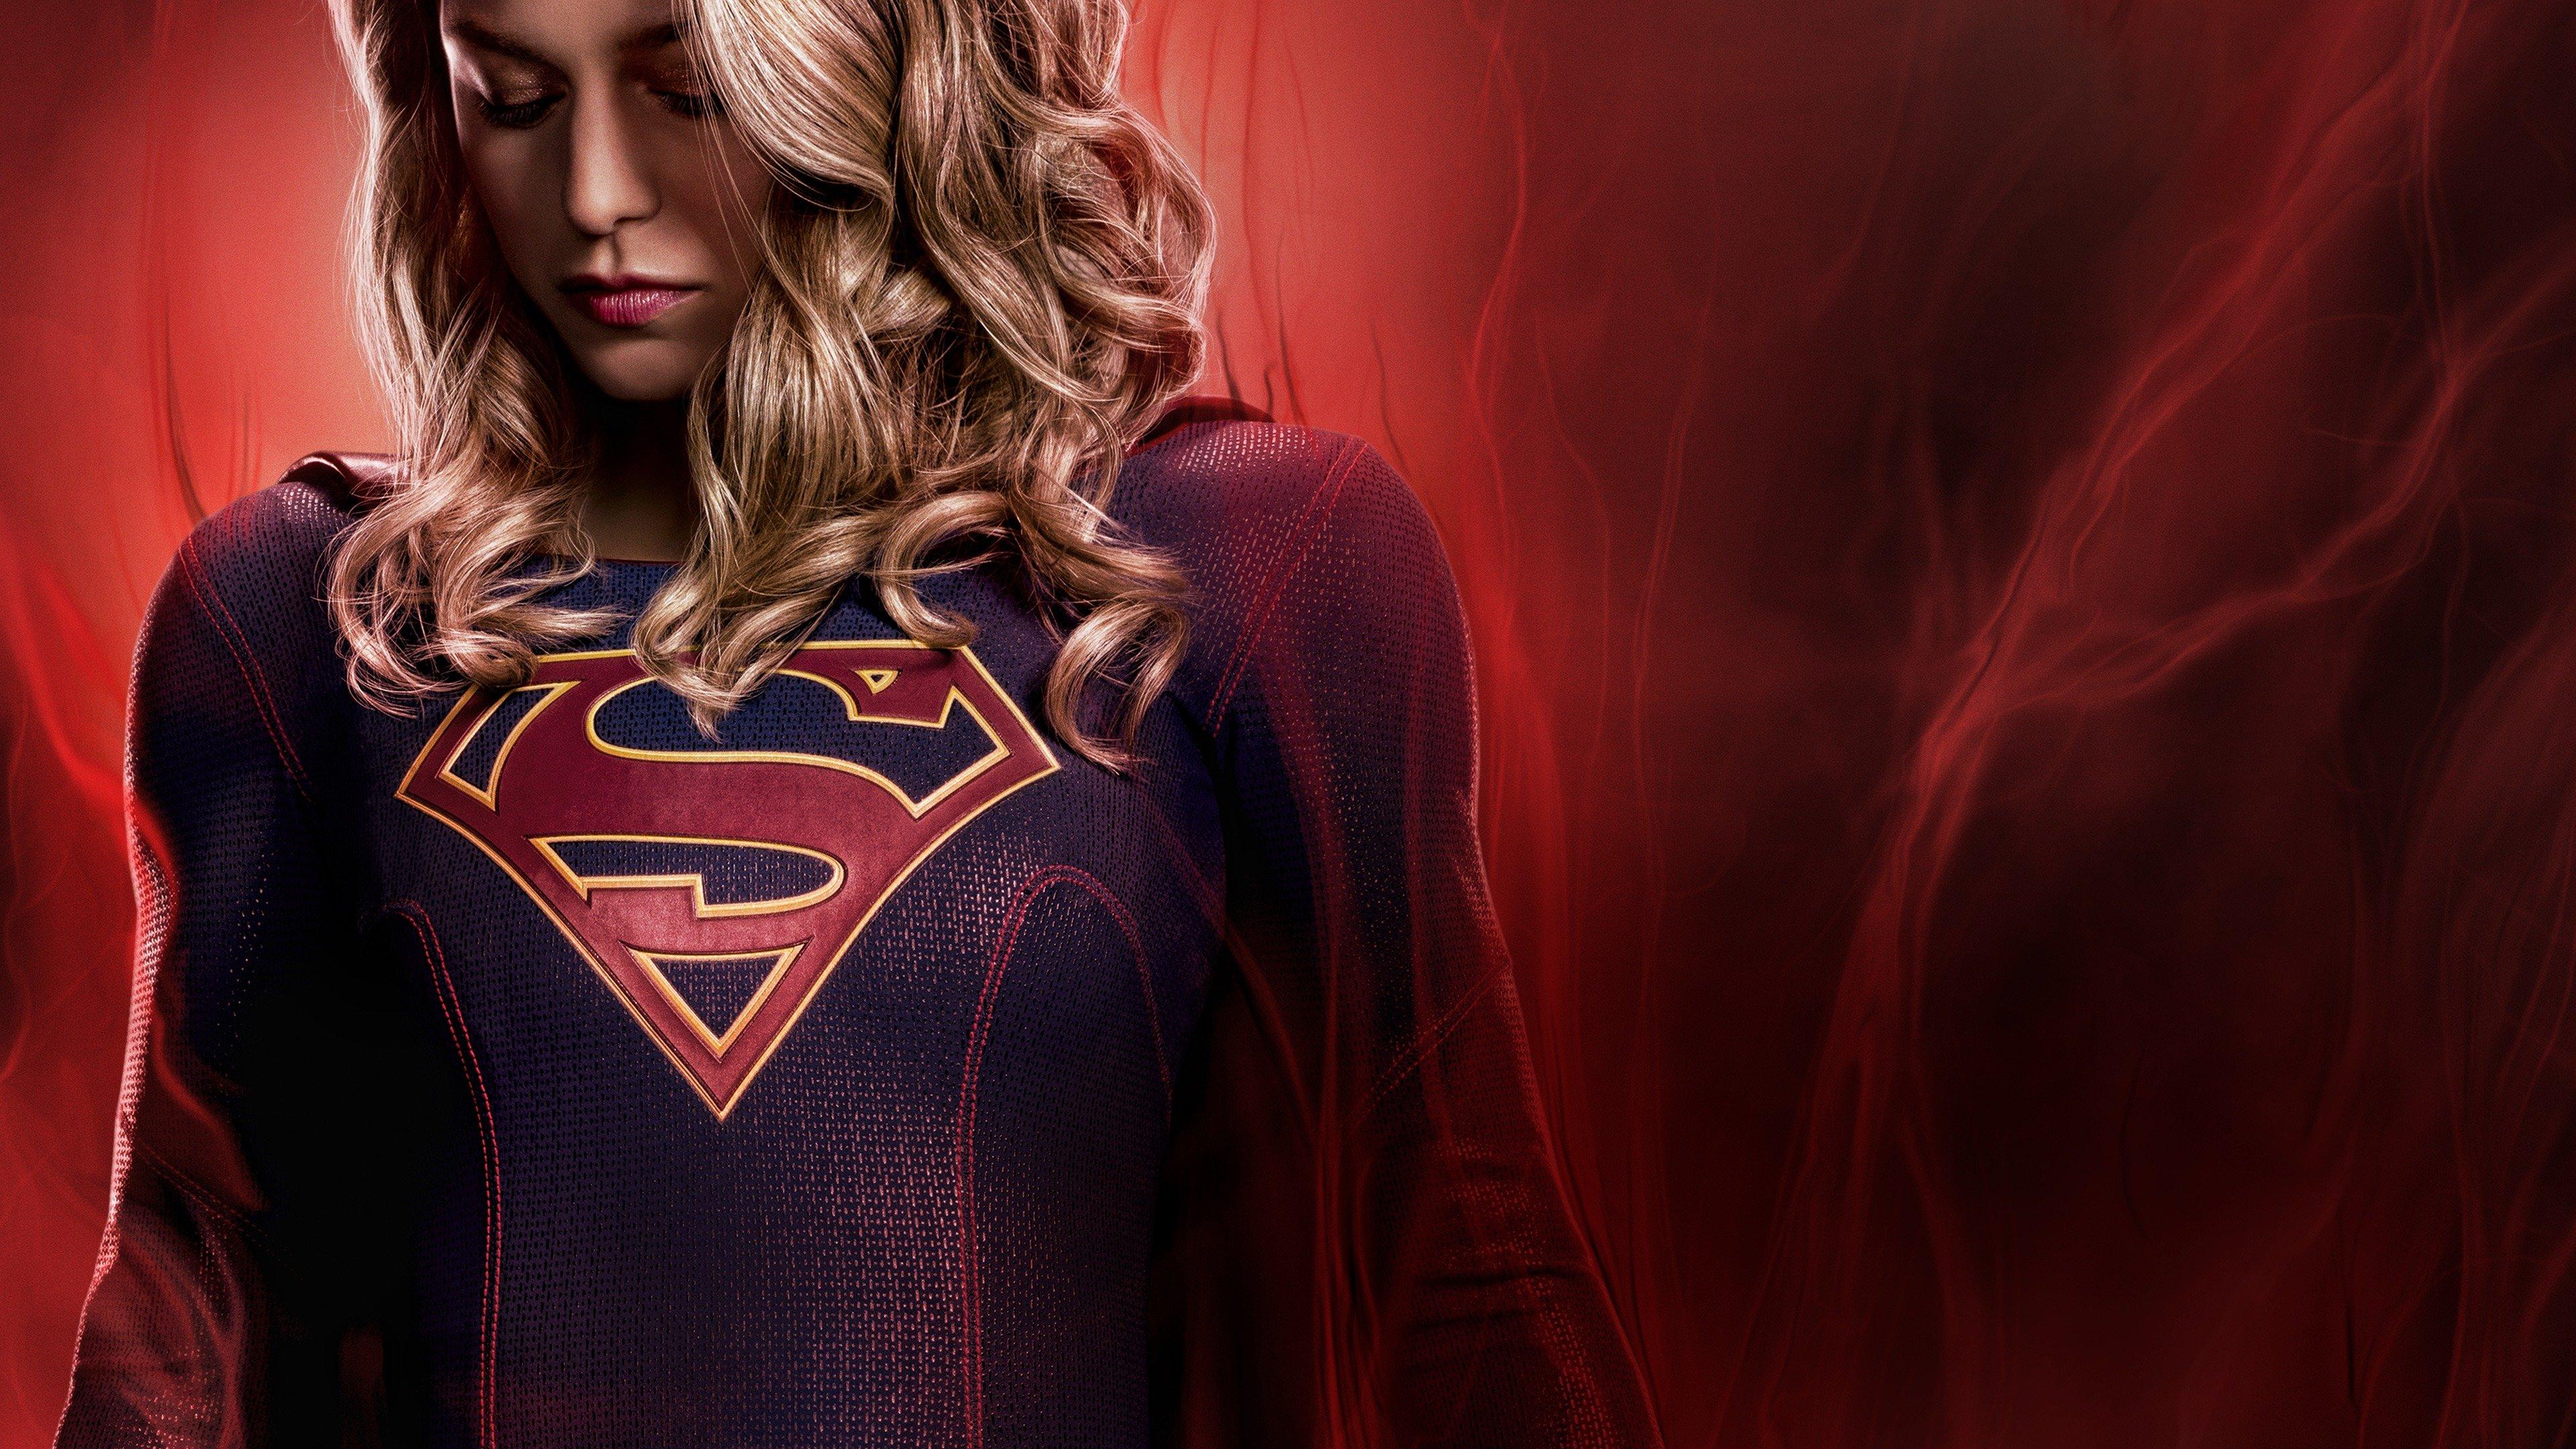 Girl Face Wallpaper 5k Supergirl Season 4 4k Wallpapers Hd Wallpapers